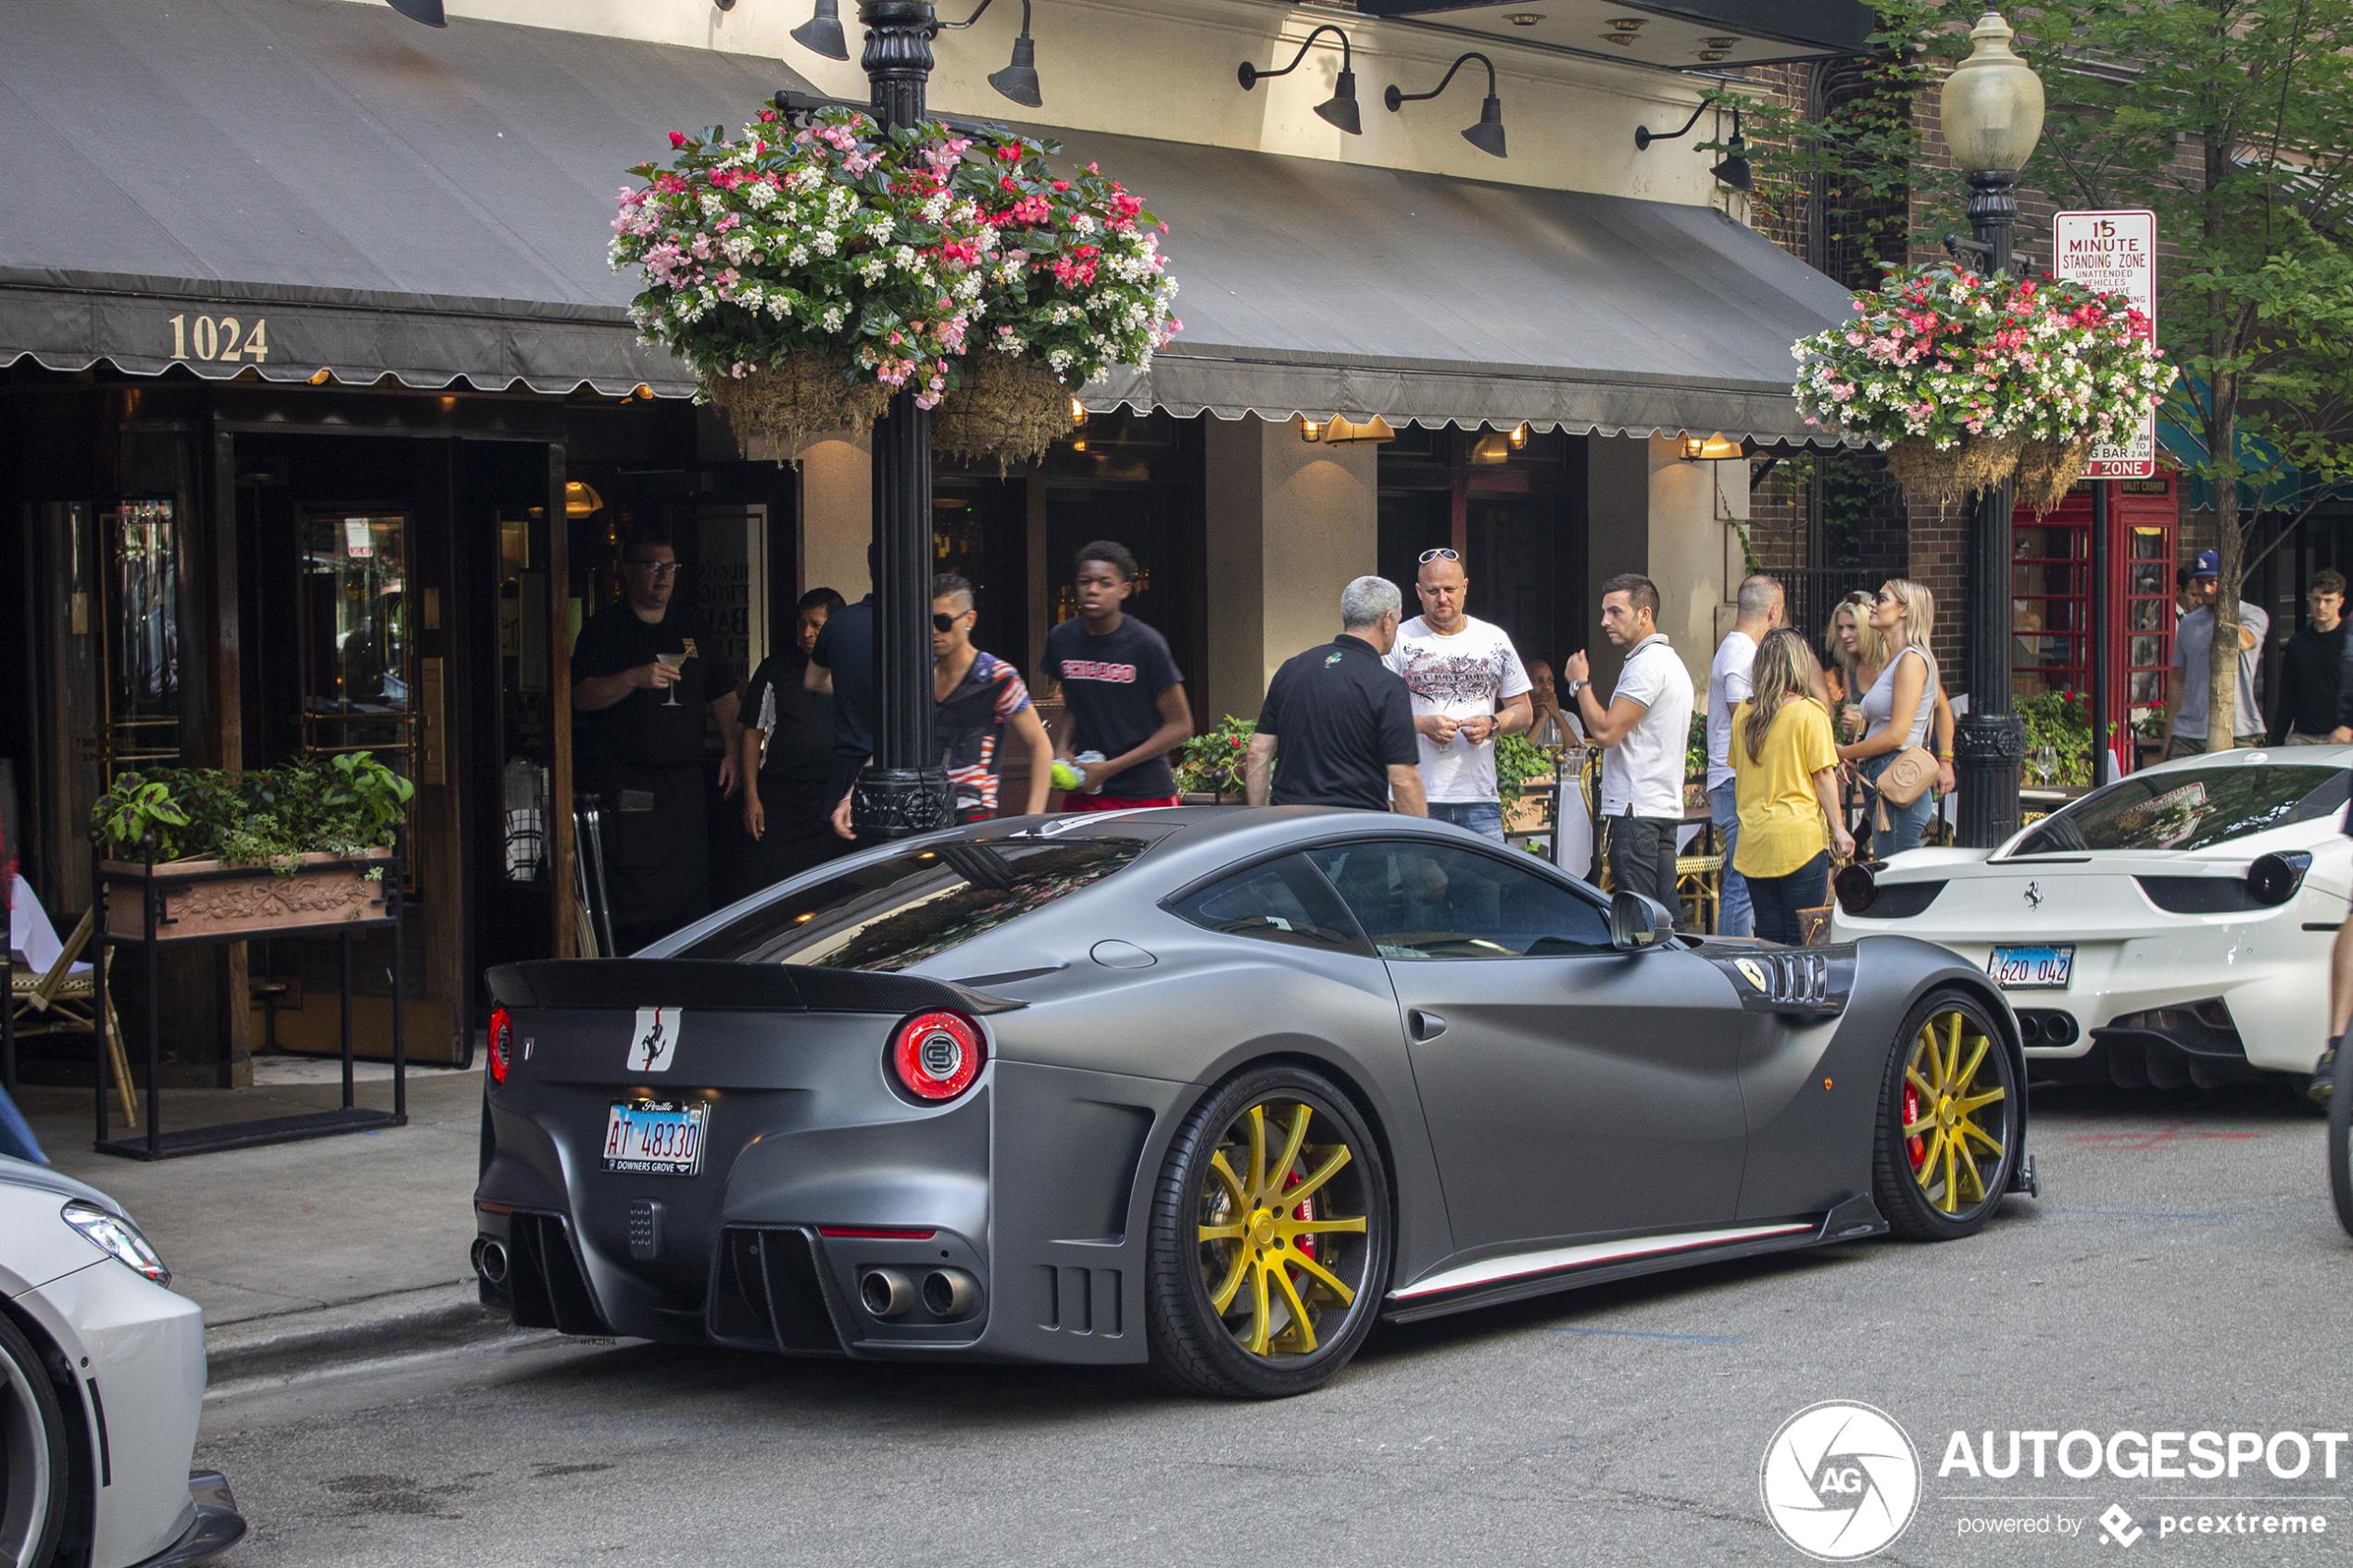 Spot of the day USA: Ferrari F12berlinetta Creative Bespoke SVR